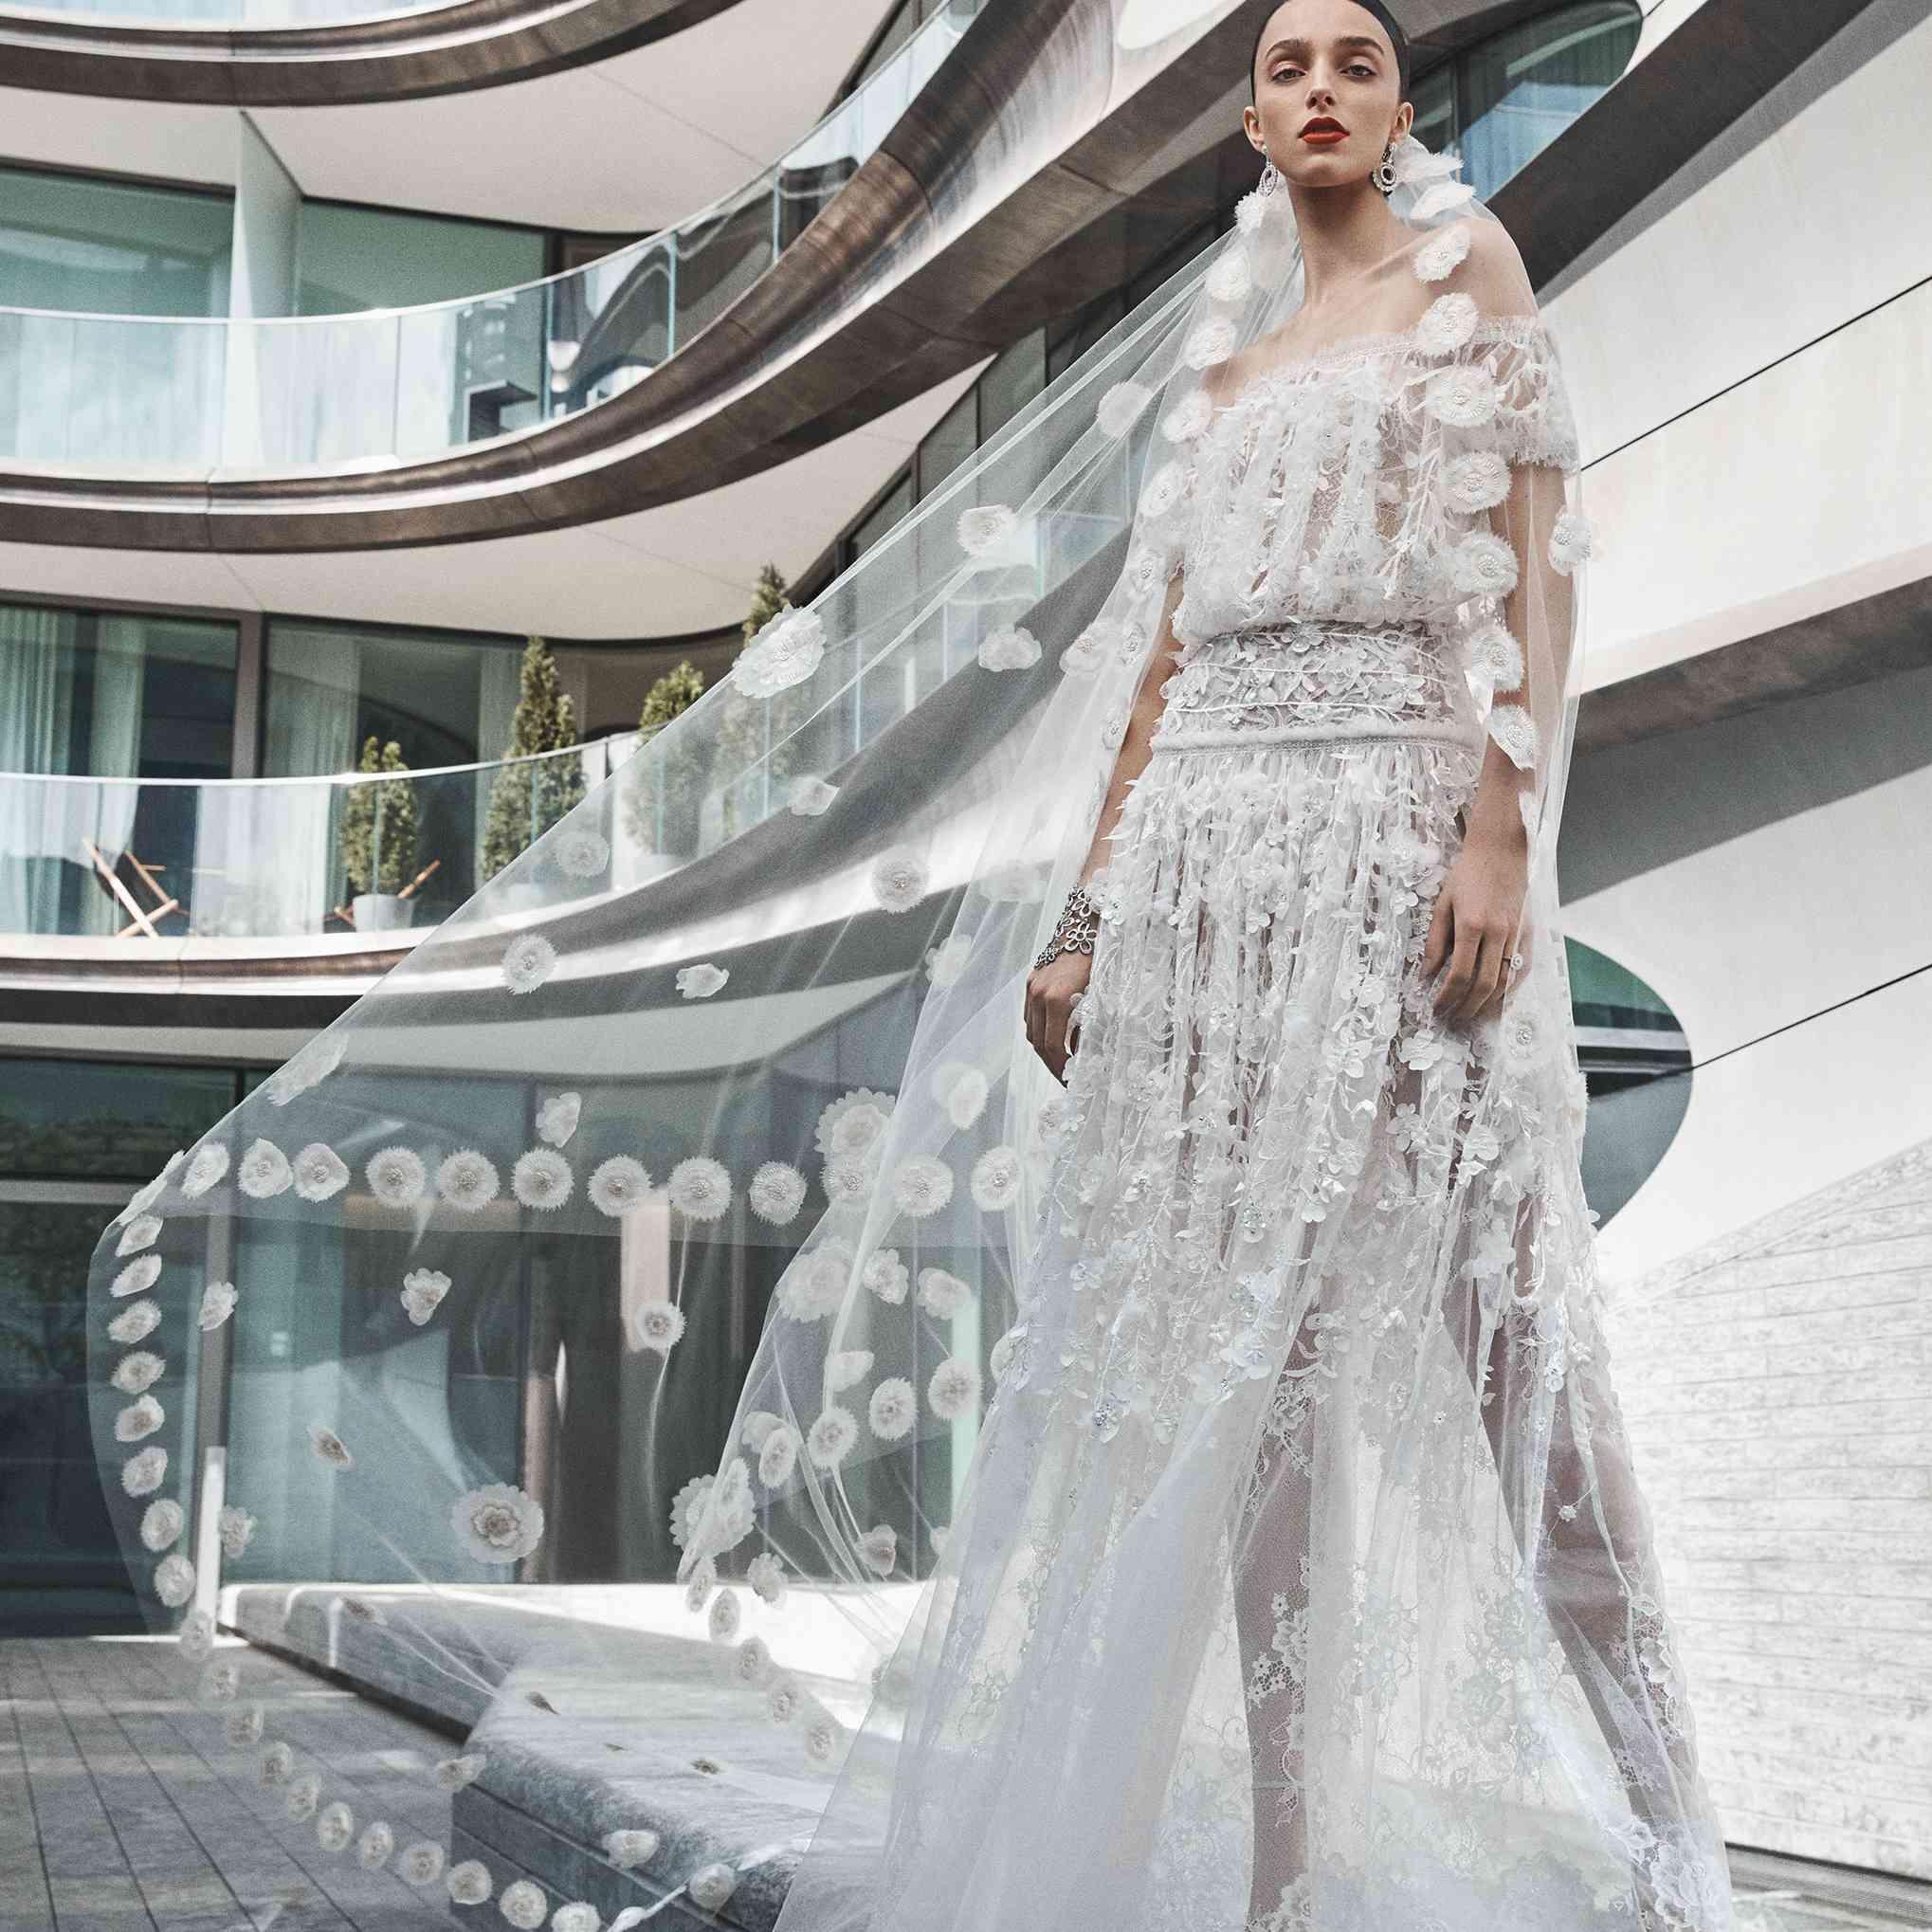 Model in off-the-shoulder floral gown